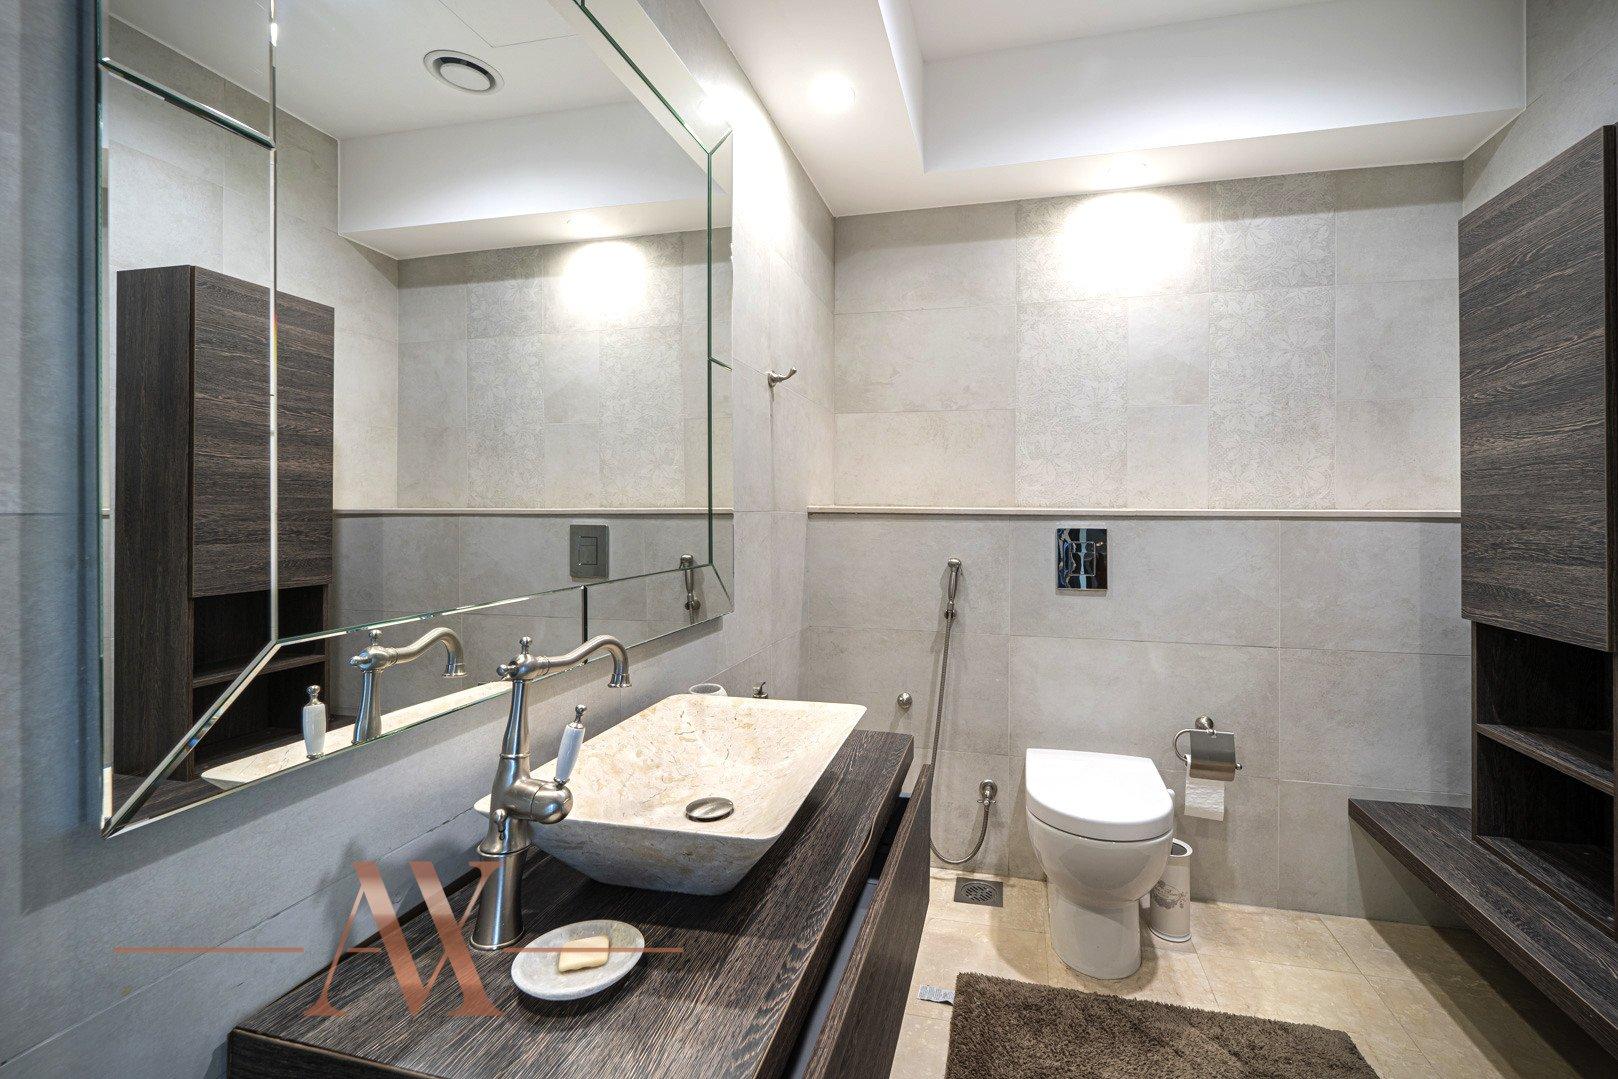 Penthouse for sale in Dubai, UAE, 5 bedrooms, 1057 m2, No. 23747 – photo 5